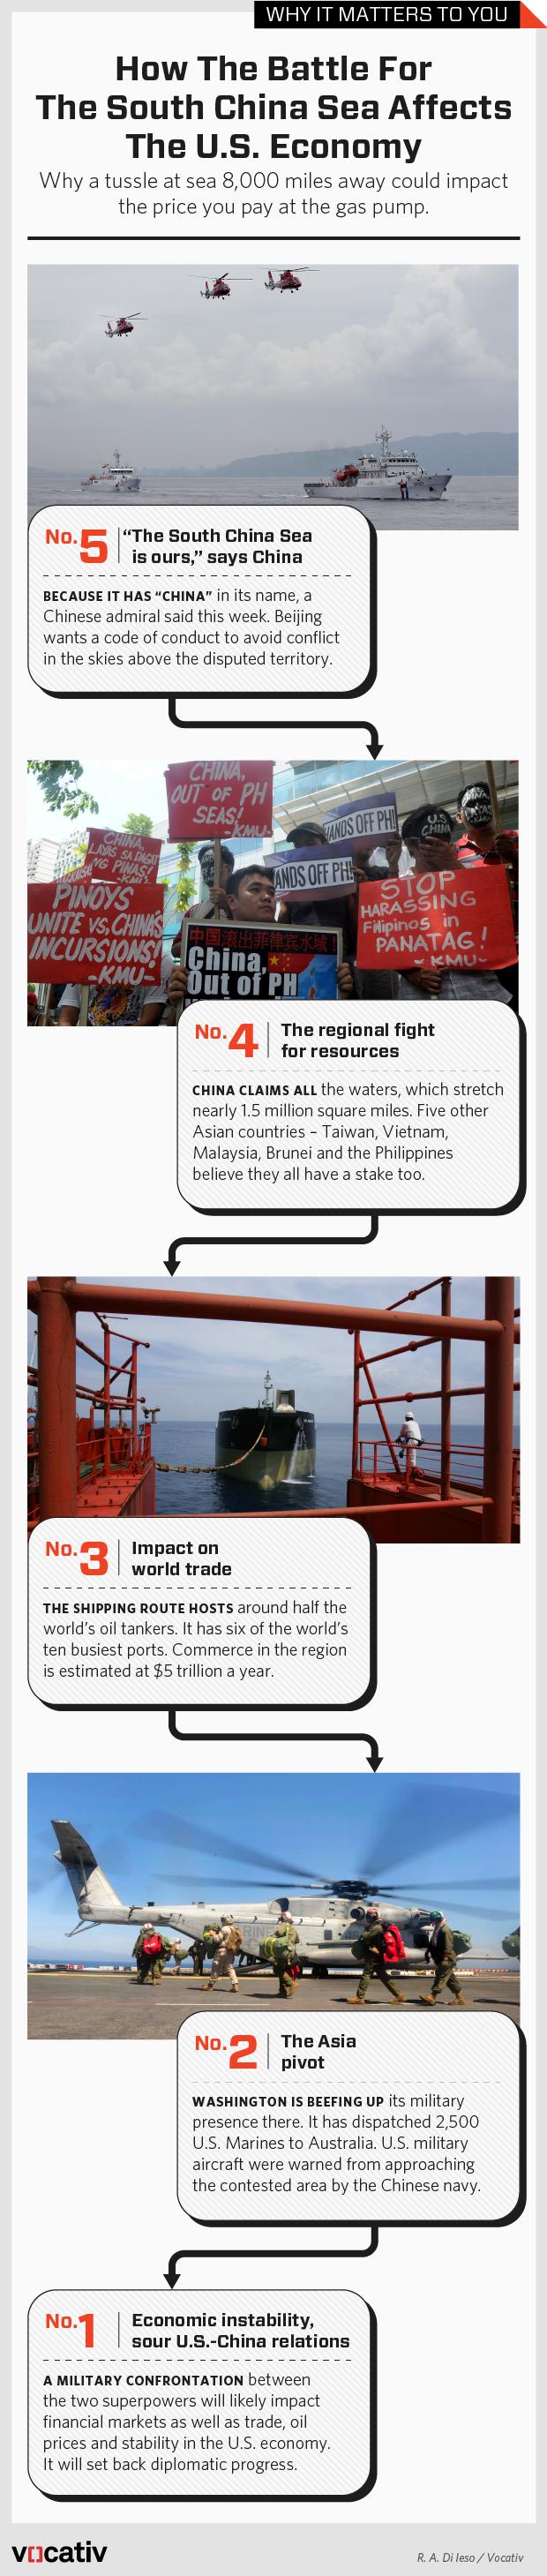 WIM_s_china_sea_15SEP2015